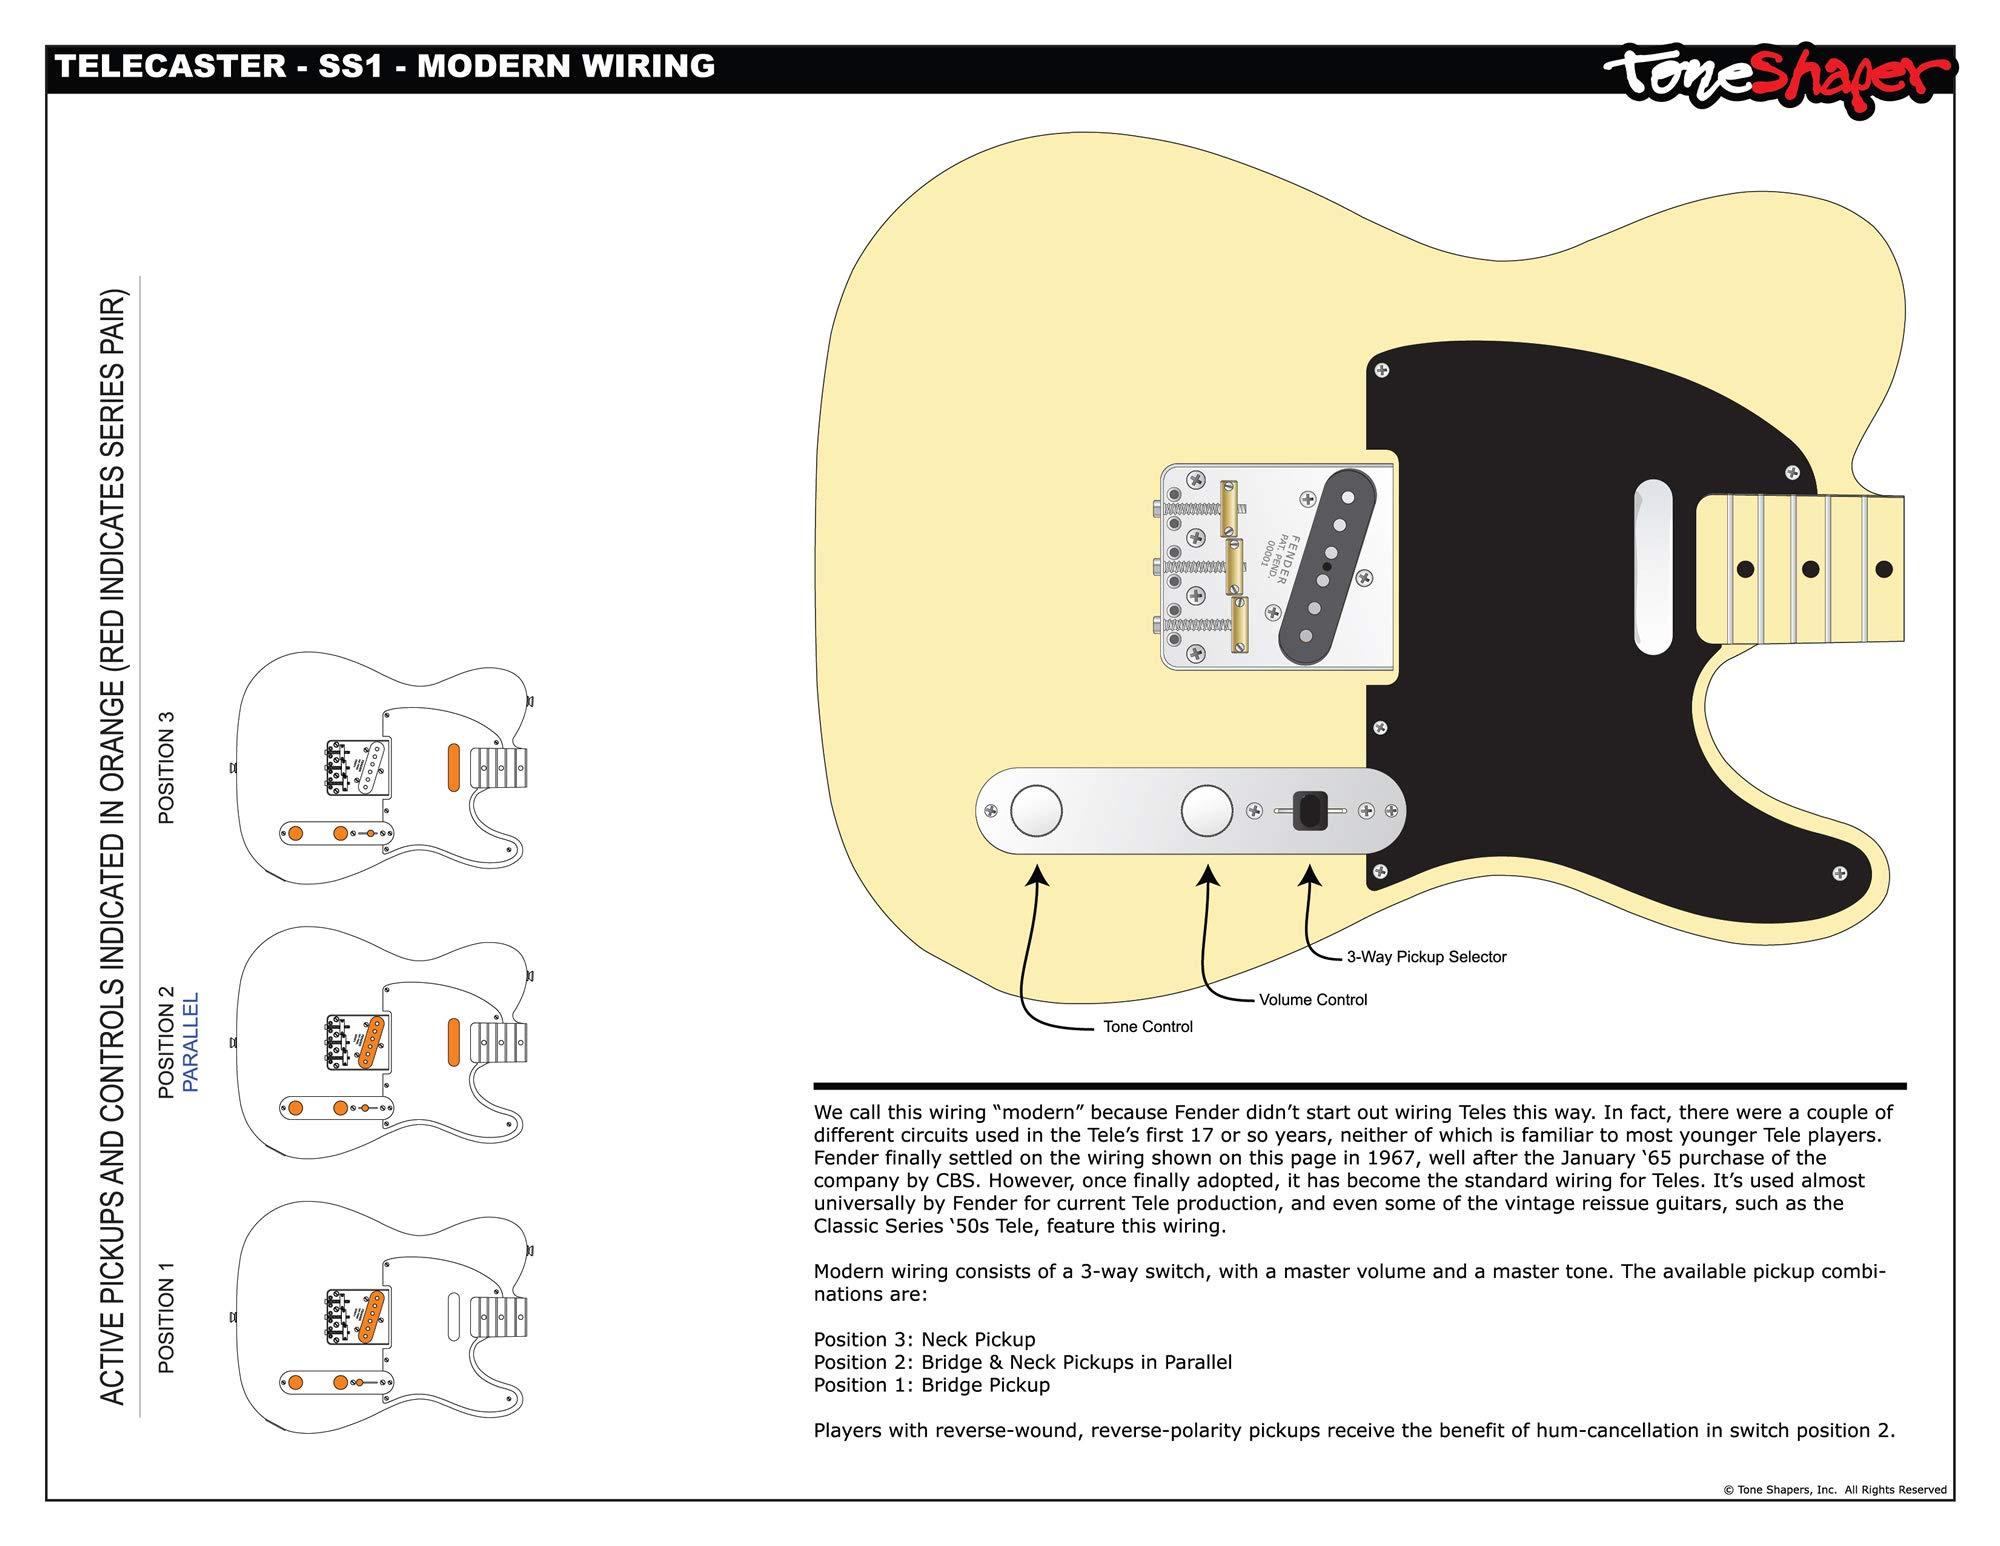 Toneshaper Guitar Wiring Kit For Fender Telecaster Ss1 Modern Wiring Amazon Co Uk Musical Instruments